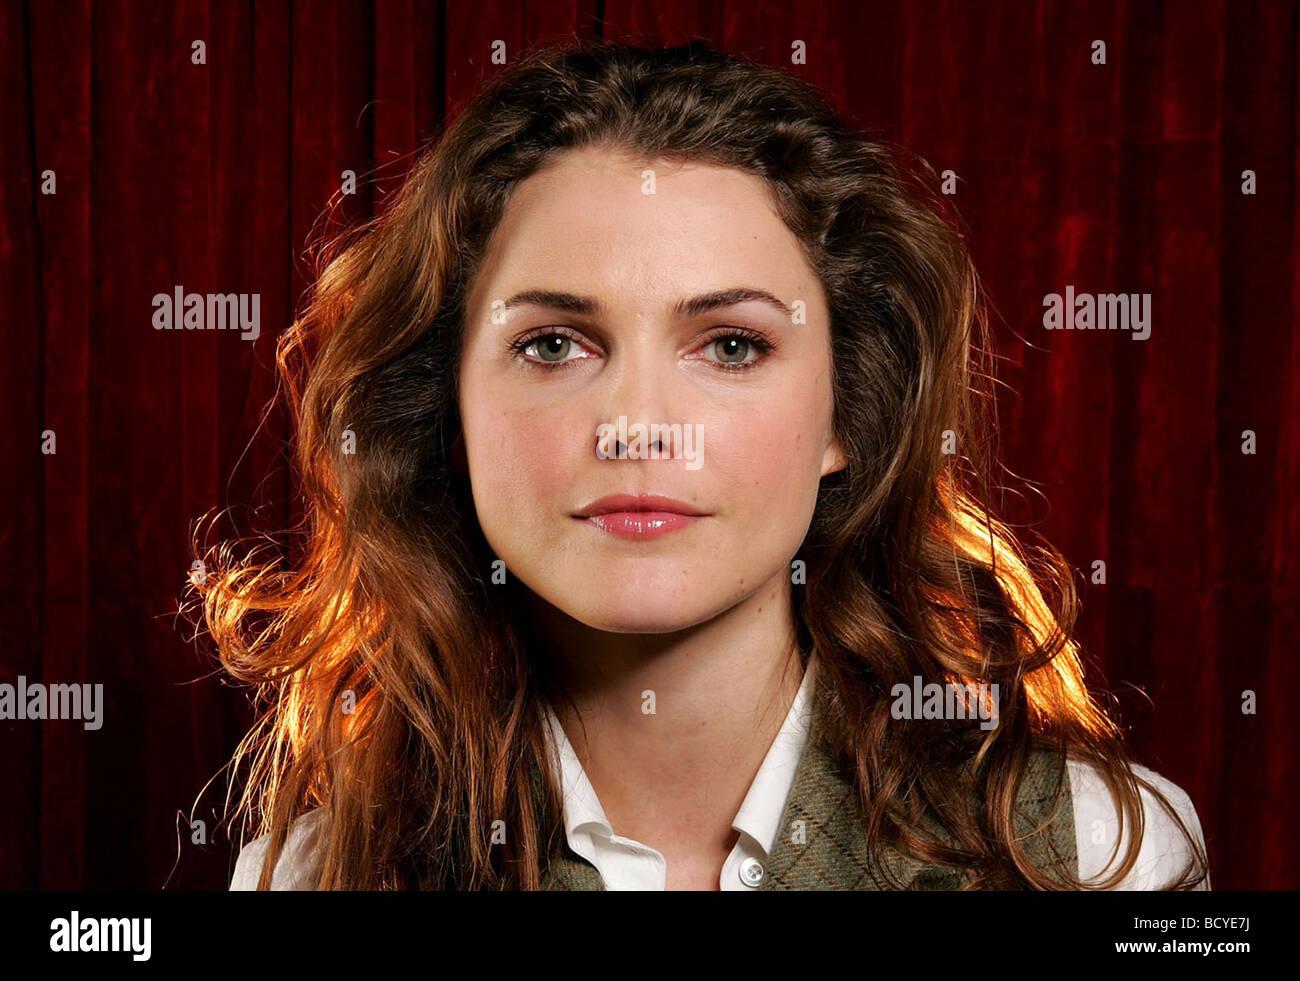 Felicity (TV series ) Year : 1998 - 2002 Creator : J.J. Abrams Keri Russel - Stock Image